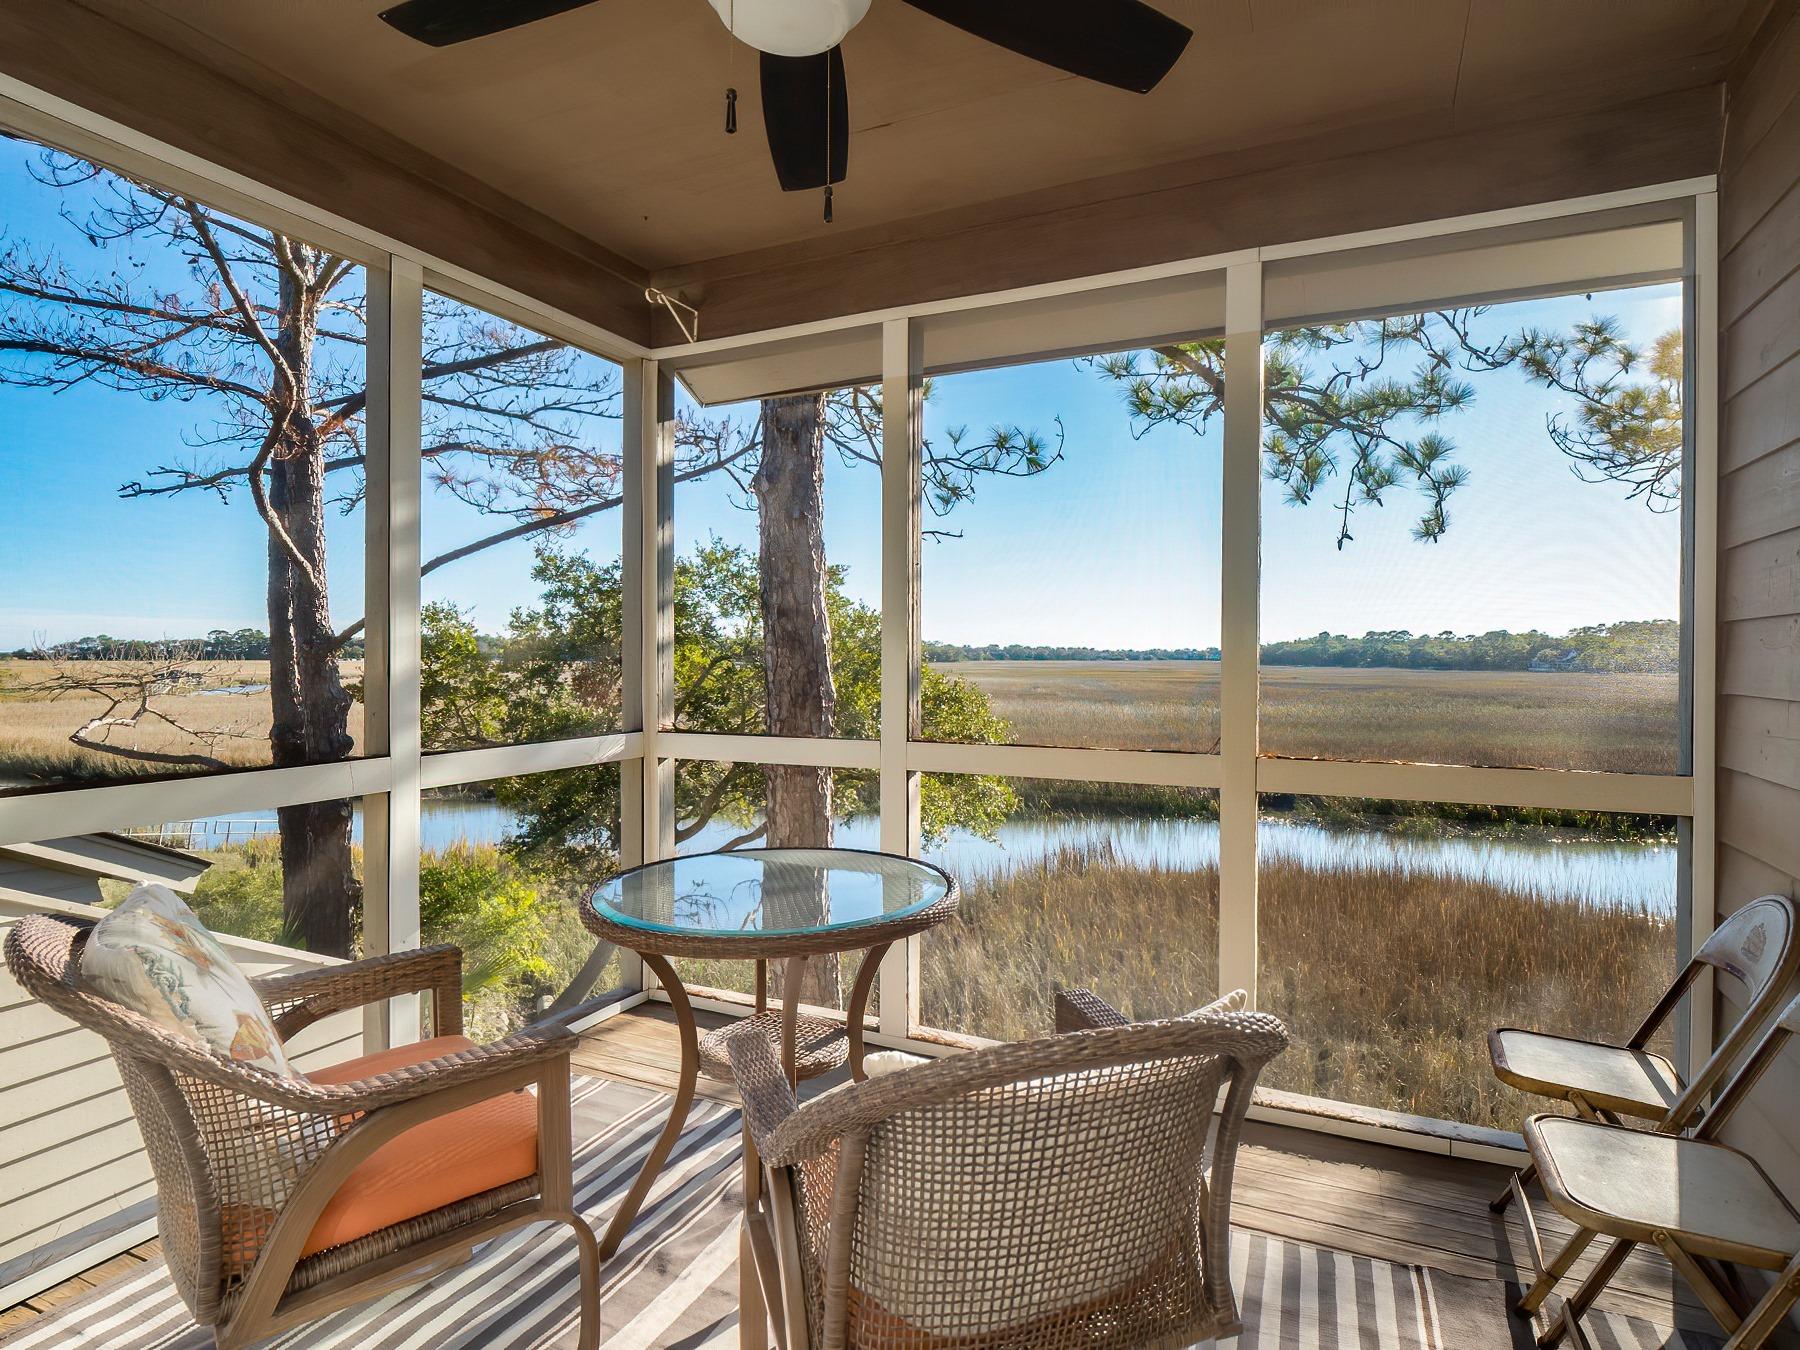 Coastal Getaways of South Carolina Vacation Rental Management Company Charleston Area Seabrook Island